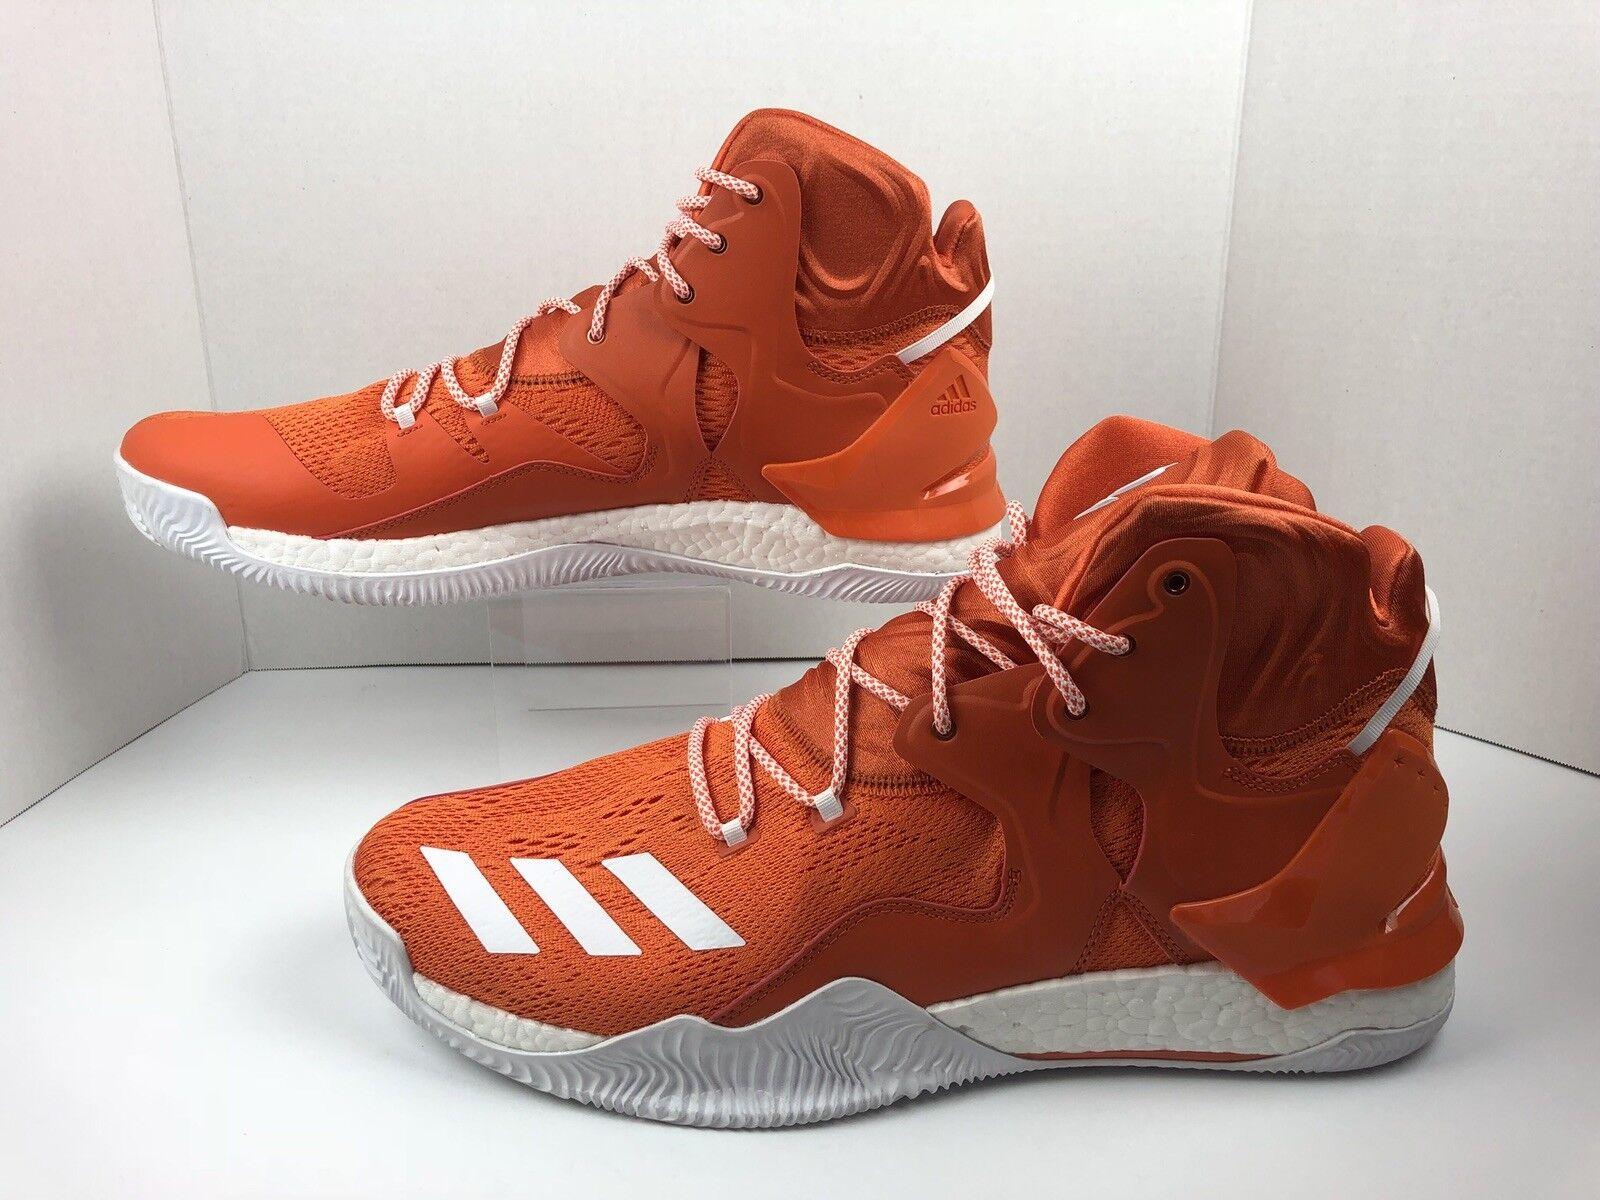 Adidas D pink 7 Boost Primeknit Performance Basketball shoes B38925 orange Sze 17